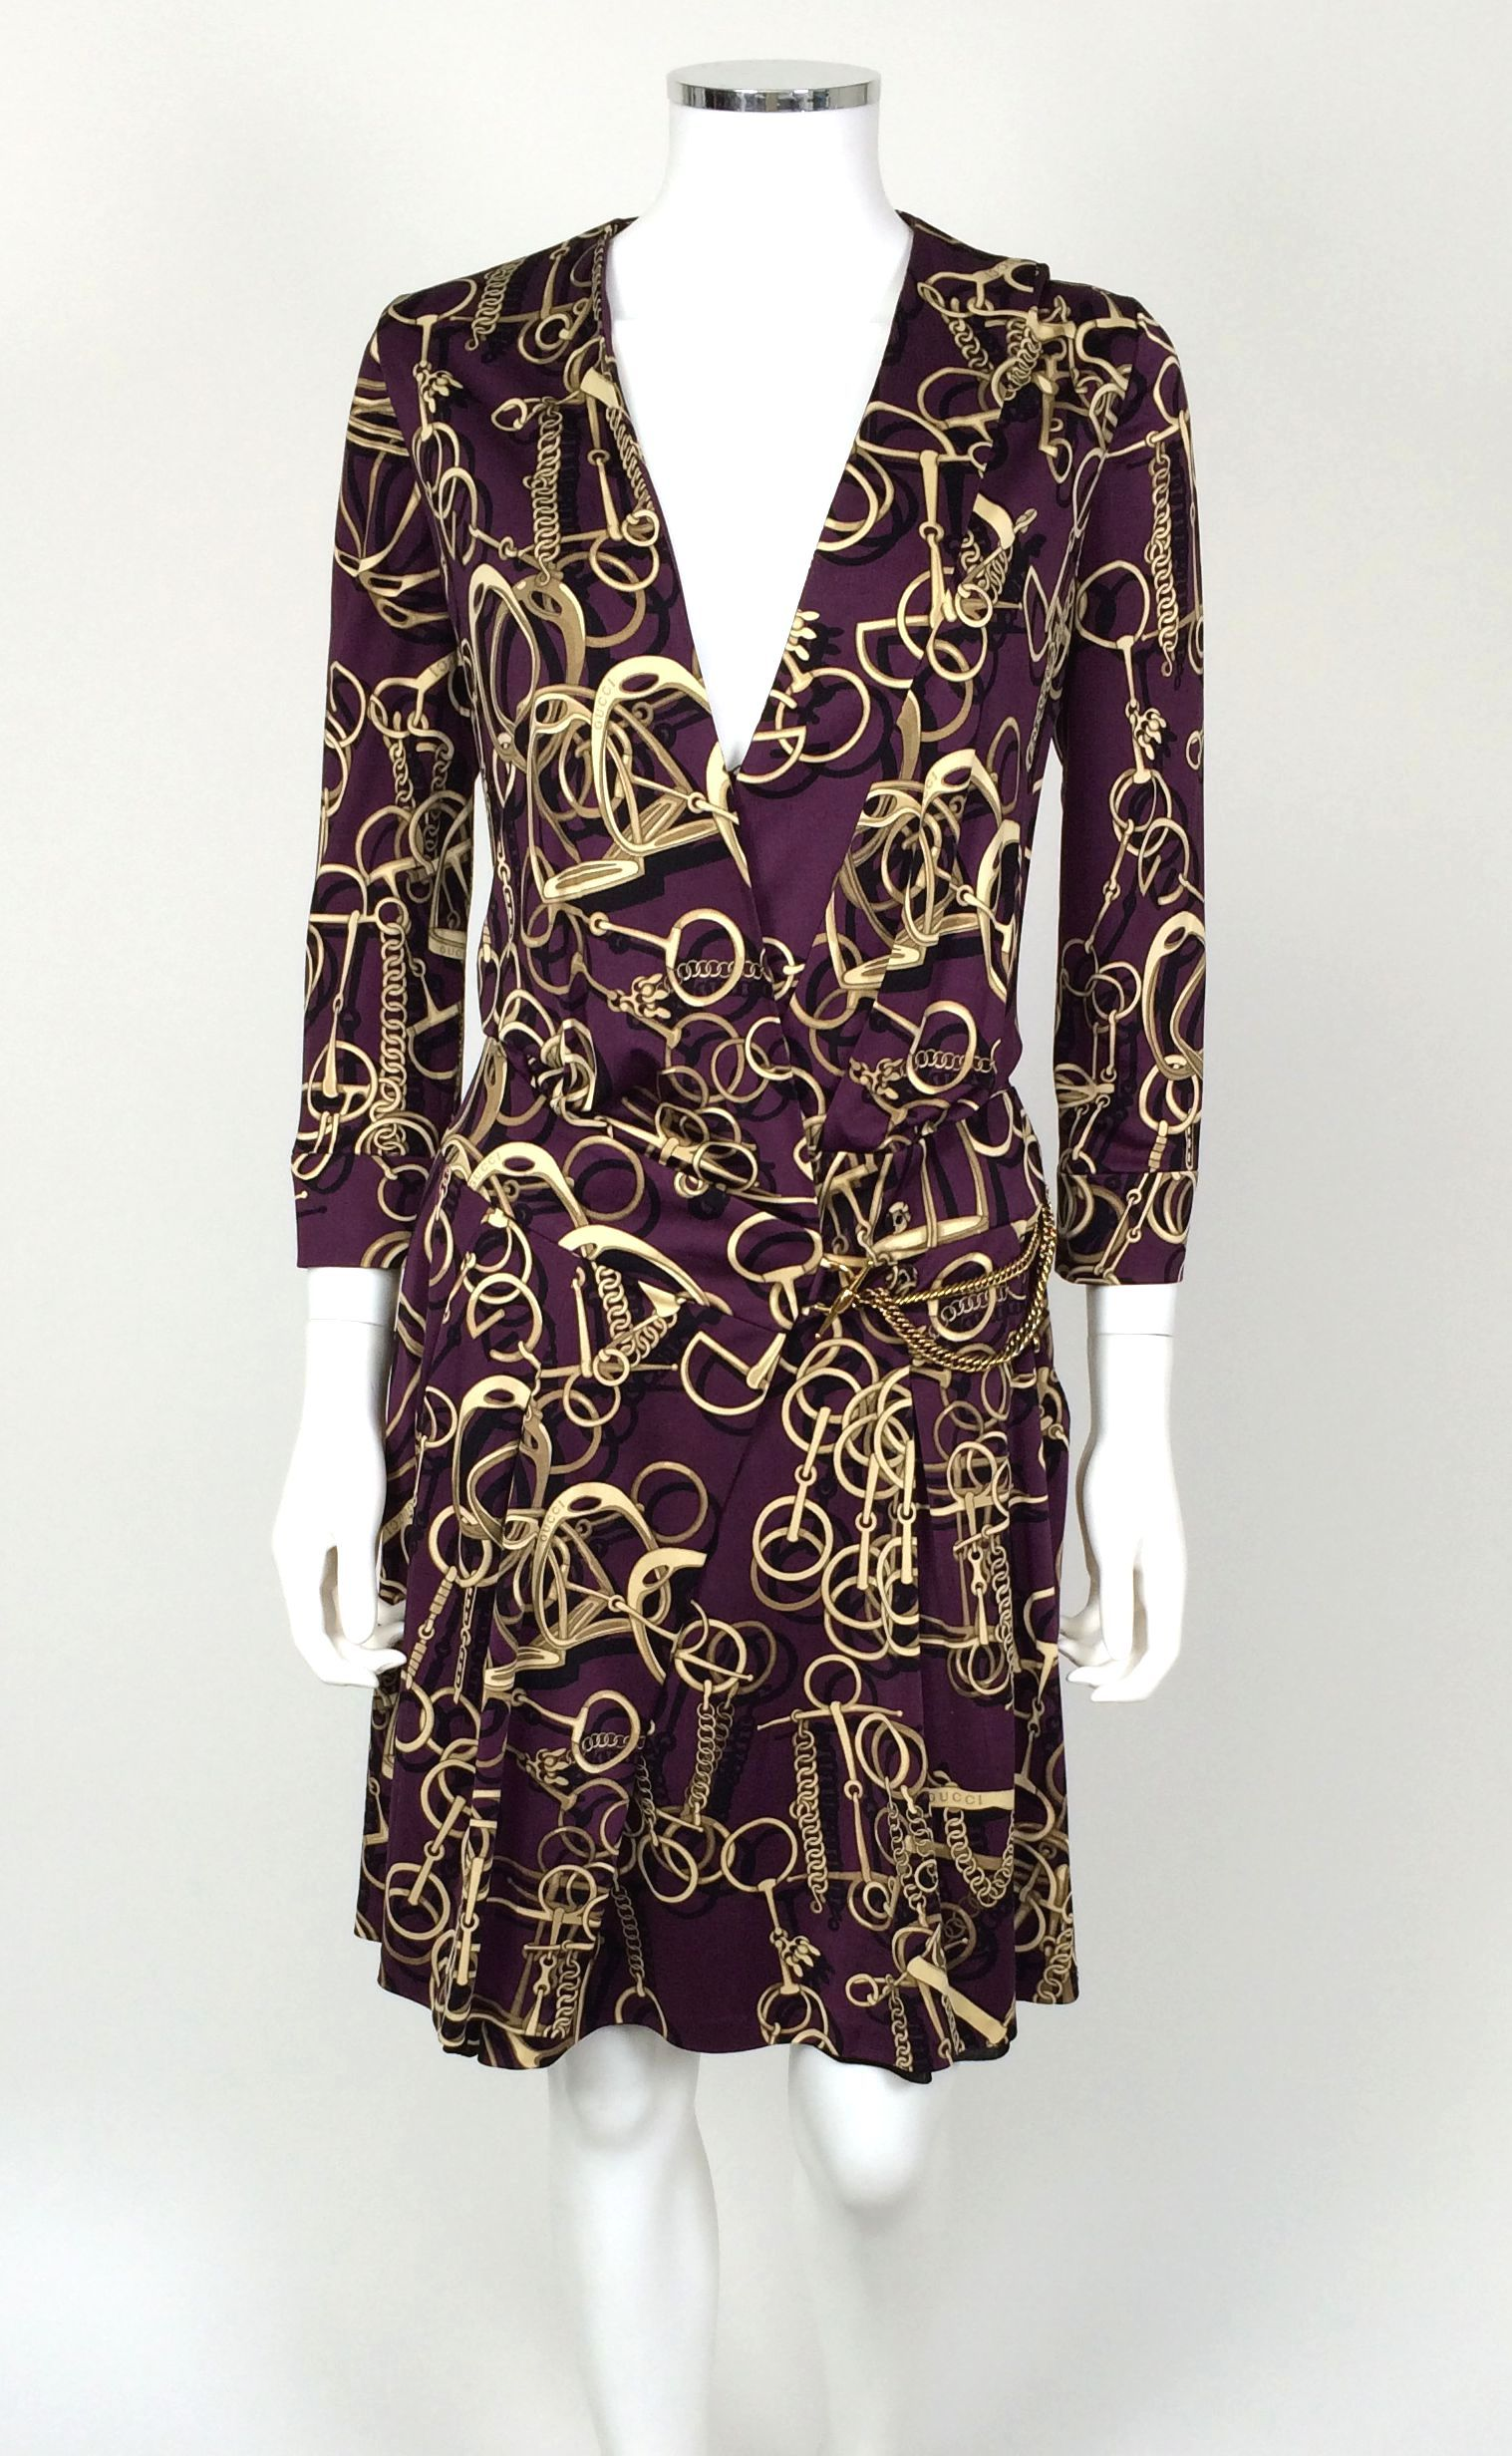 GUcci Purple Wrap Dress - Size 42 - Retail price $2,495 - Our price $570 - Sale supports Maccabi USA